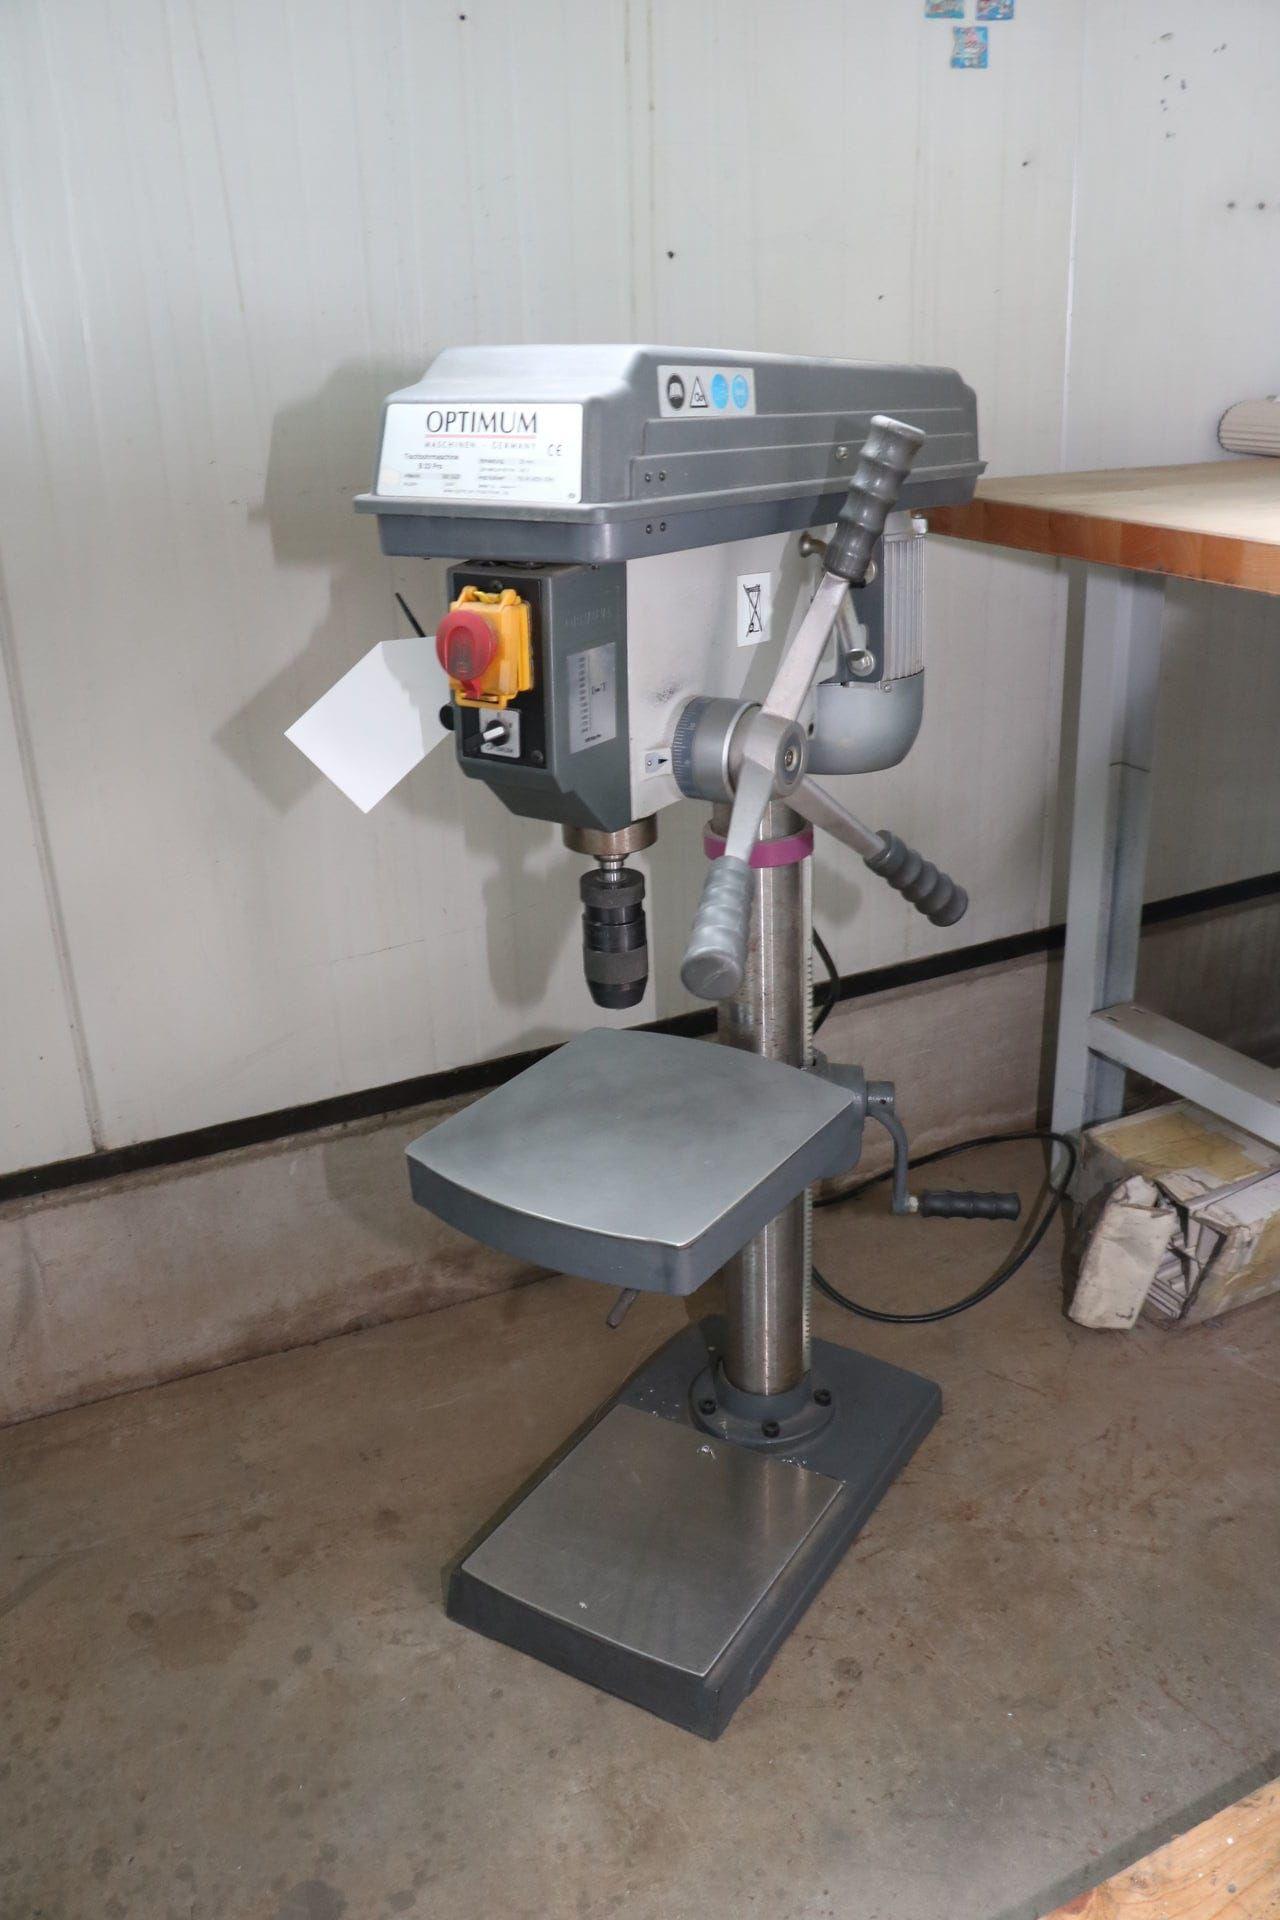 OPTIMUM B 23 PRO Tischbohrmaschine